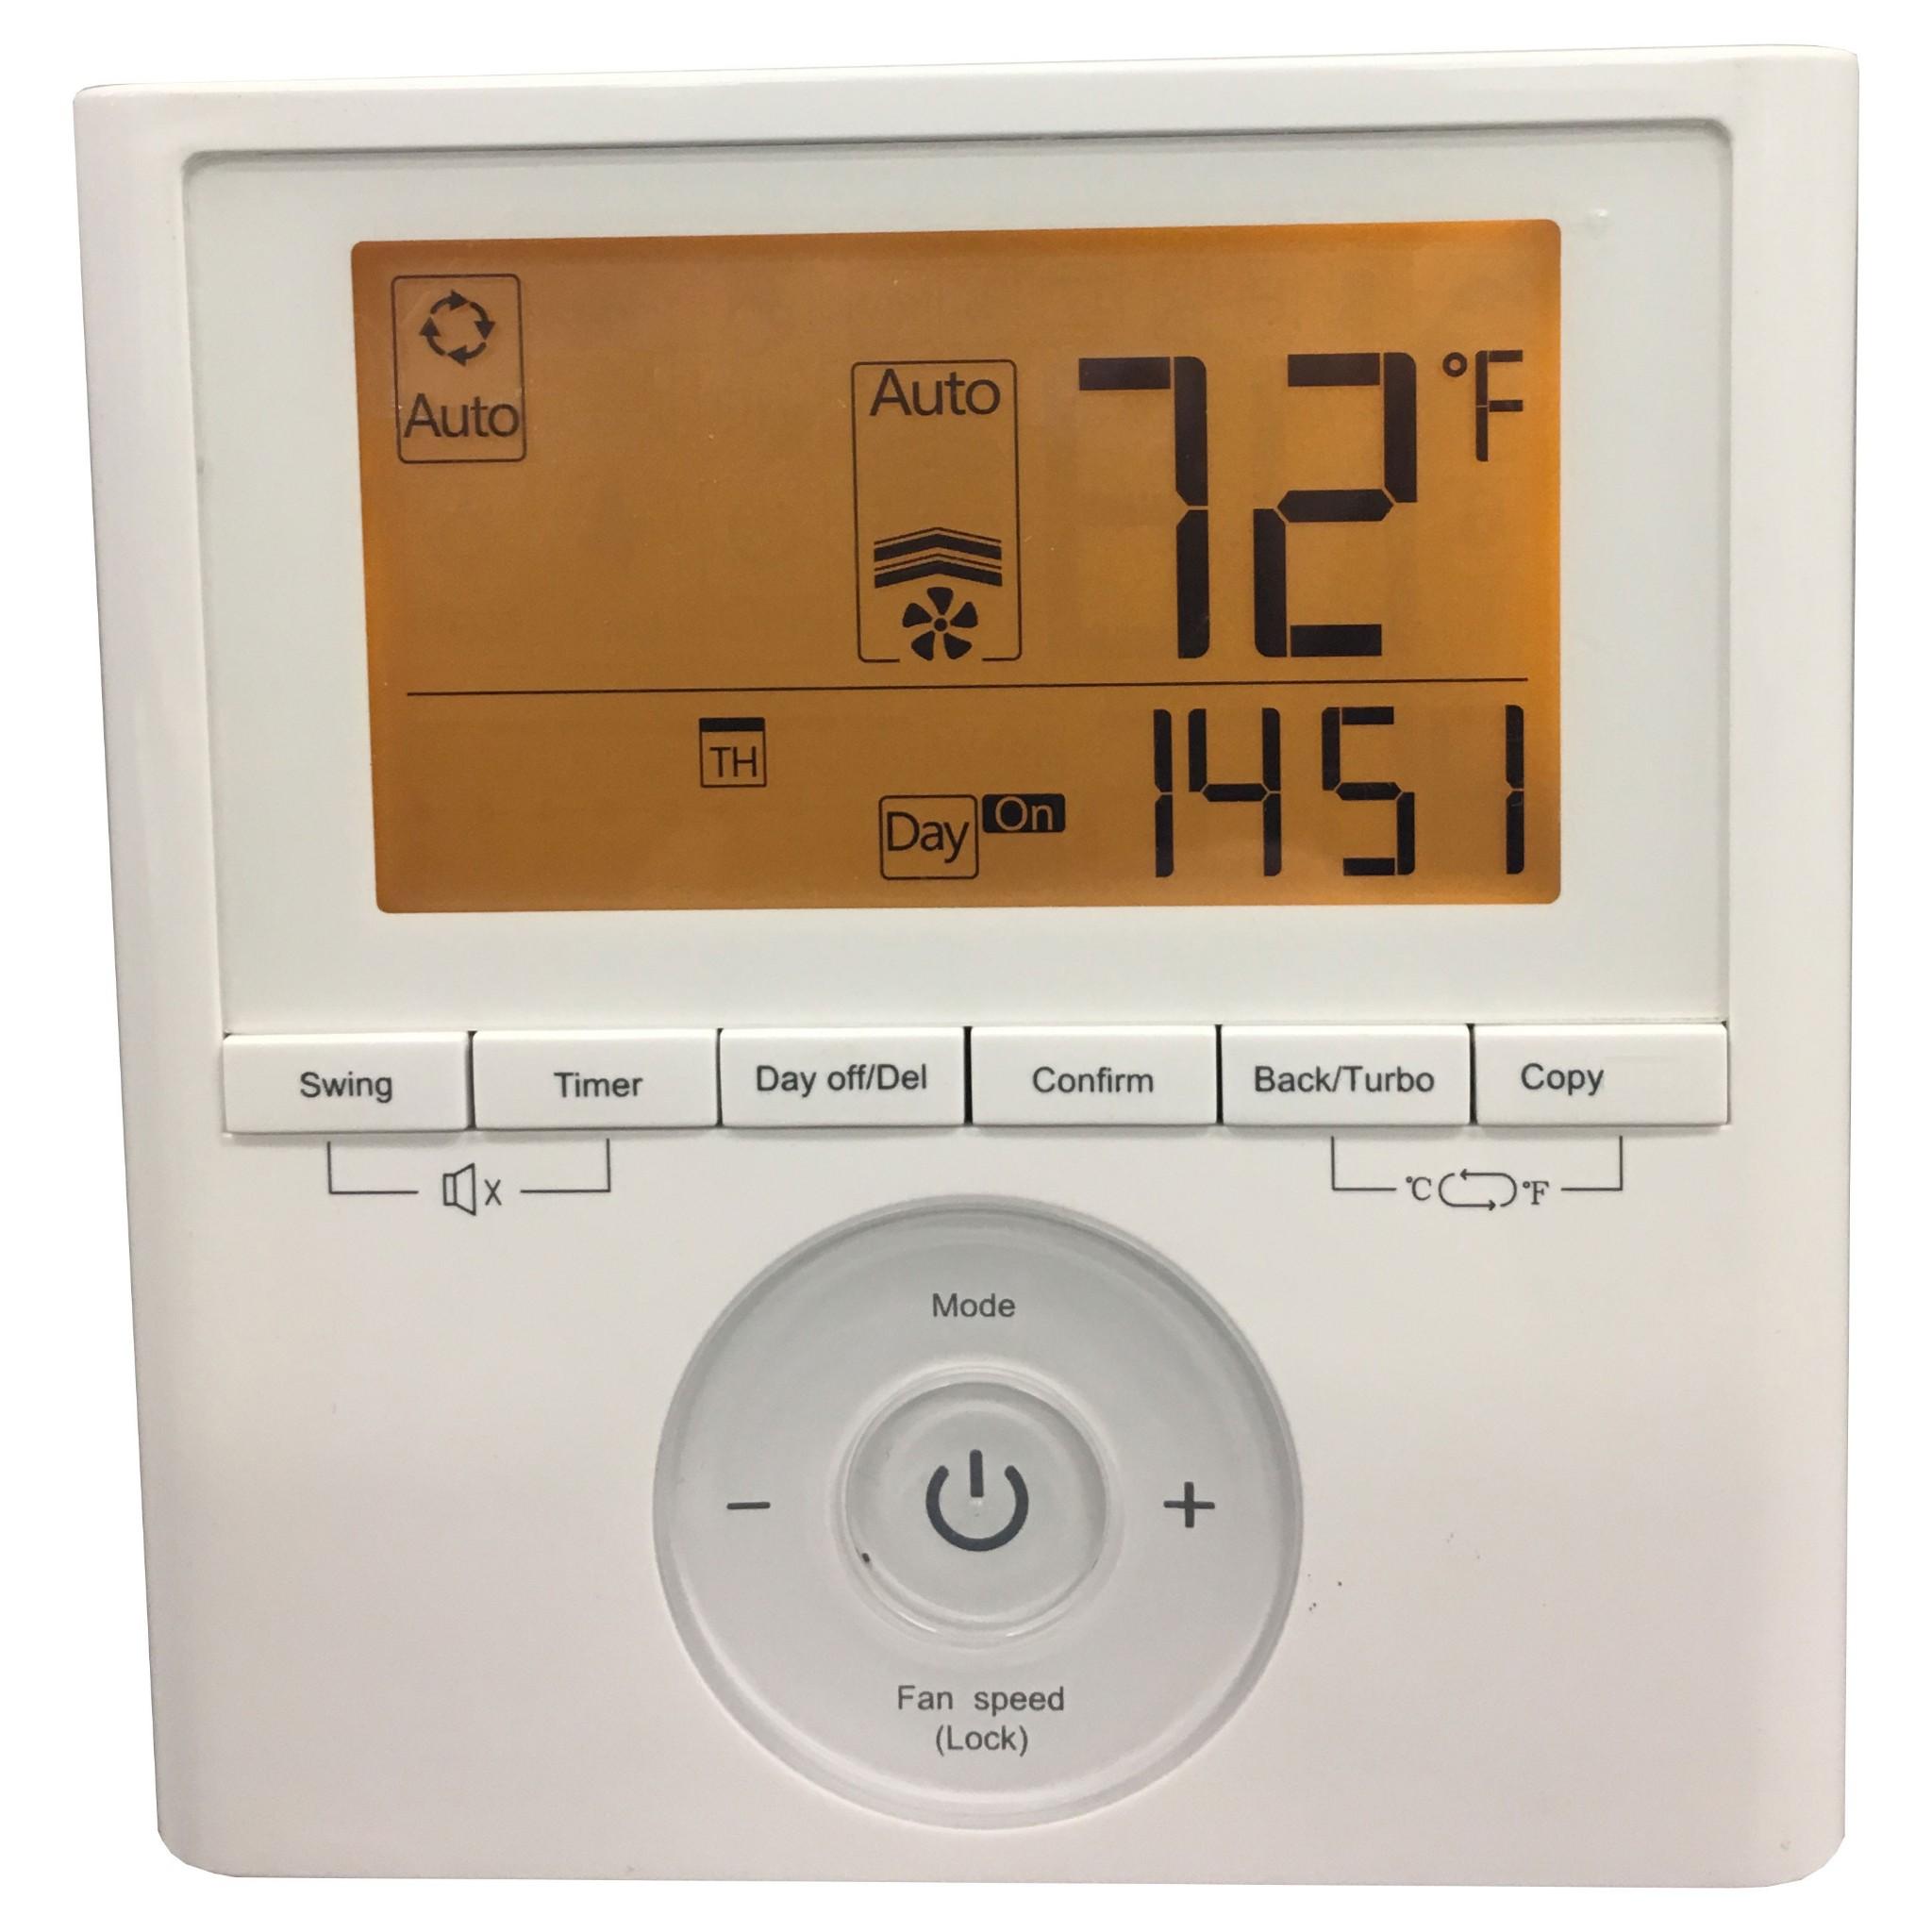 Midea Deluxe Wall Thermostat With Weekly Schedule Ksacn0401aaa Ksacn0501aaa